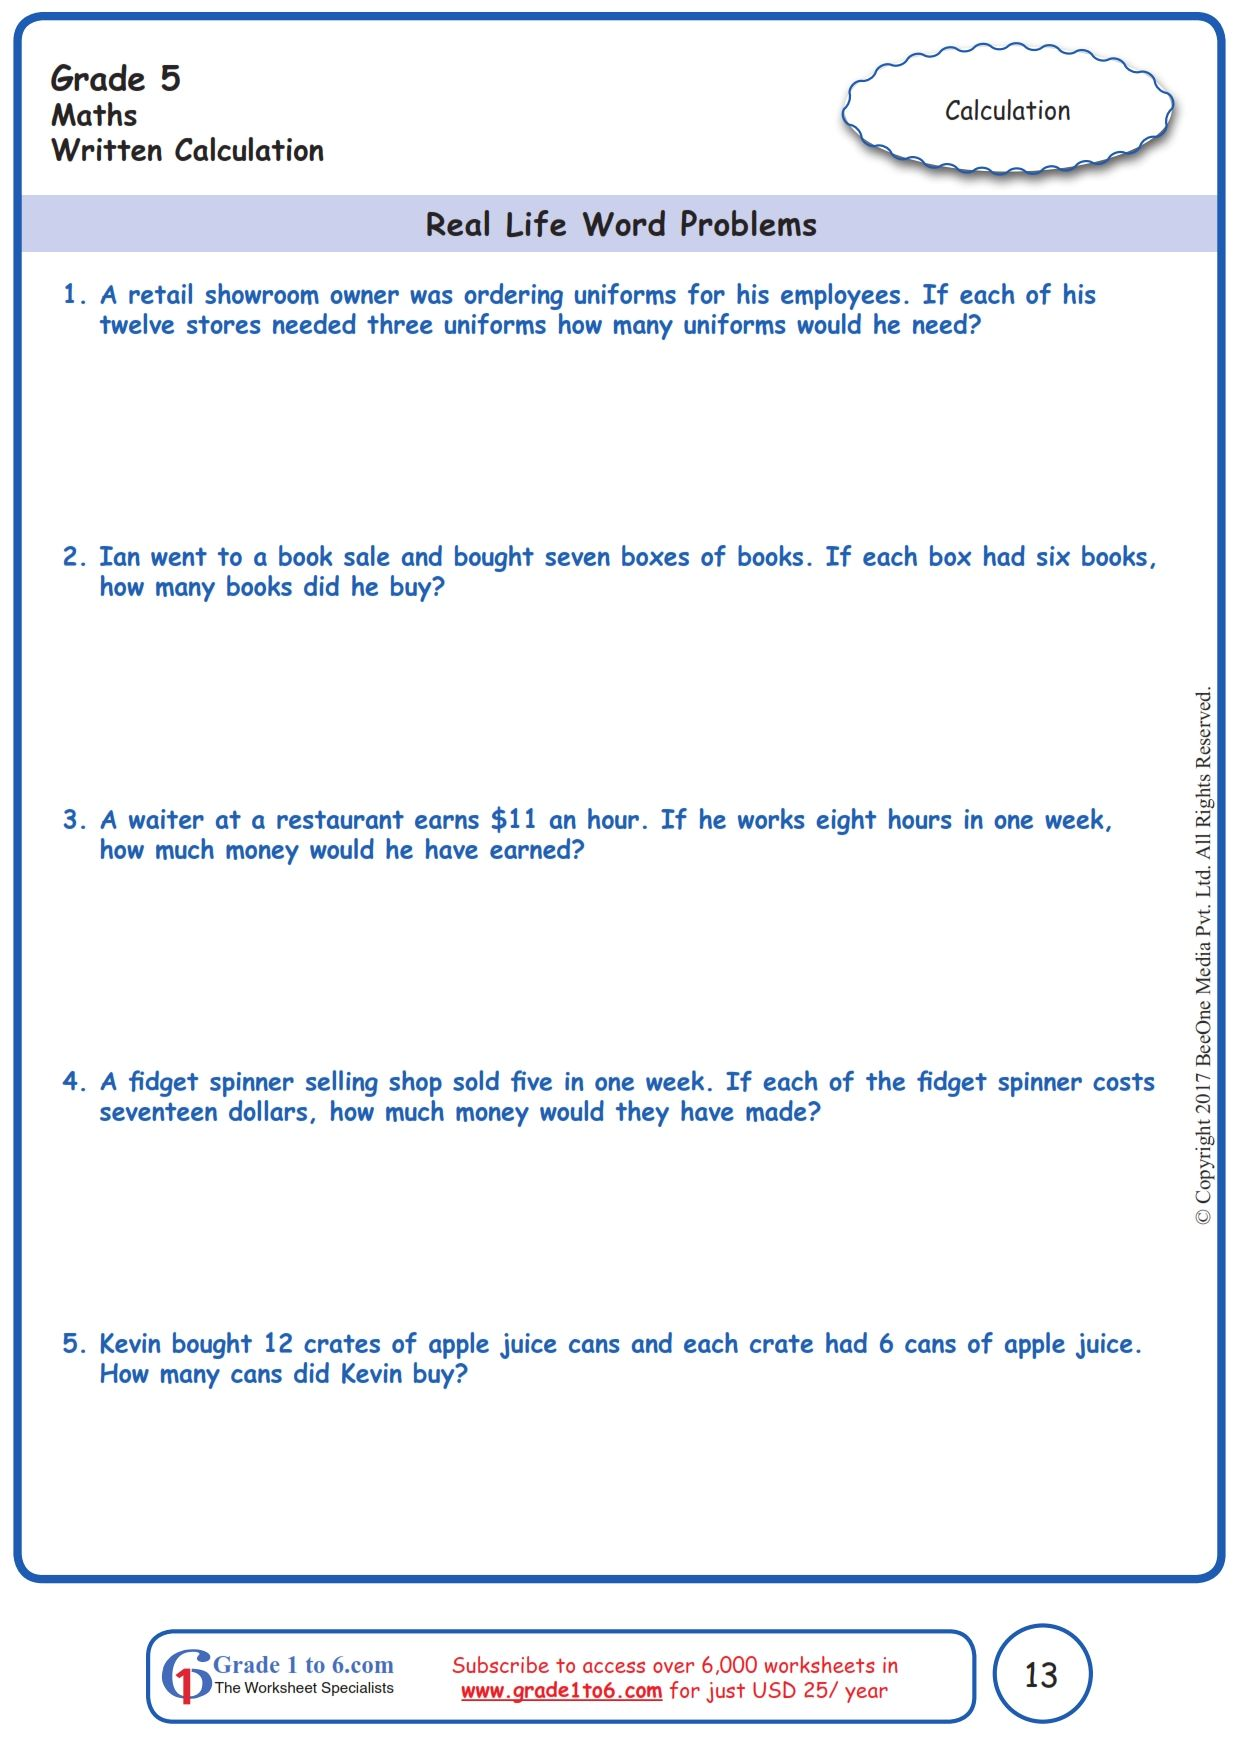 medium resolution of Worksheet Grade 5 Math Real Life Word Problems   Basic math worksheets